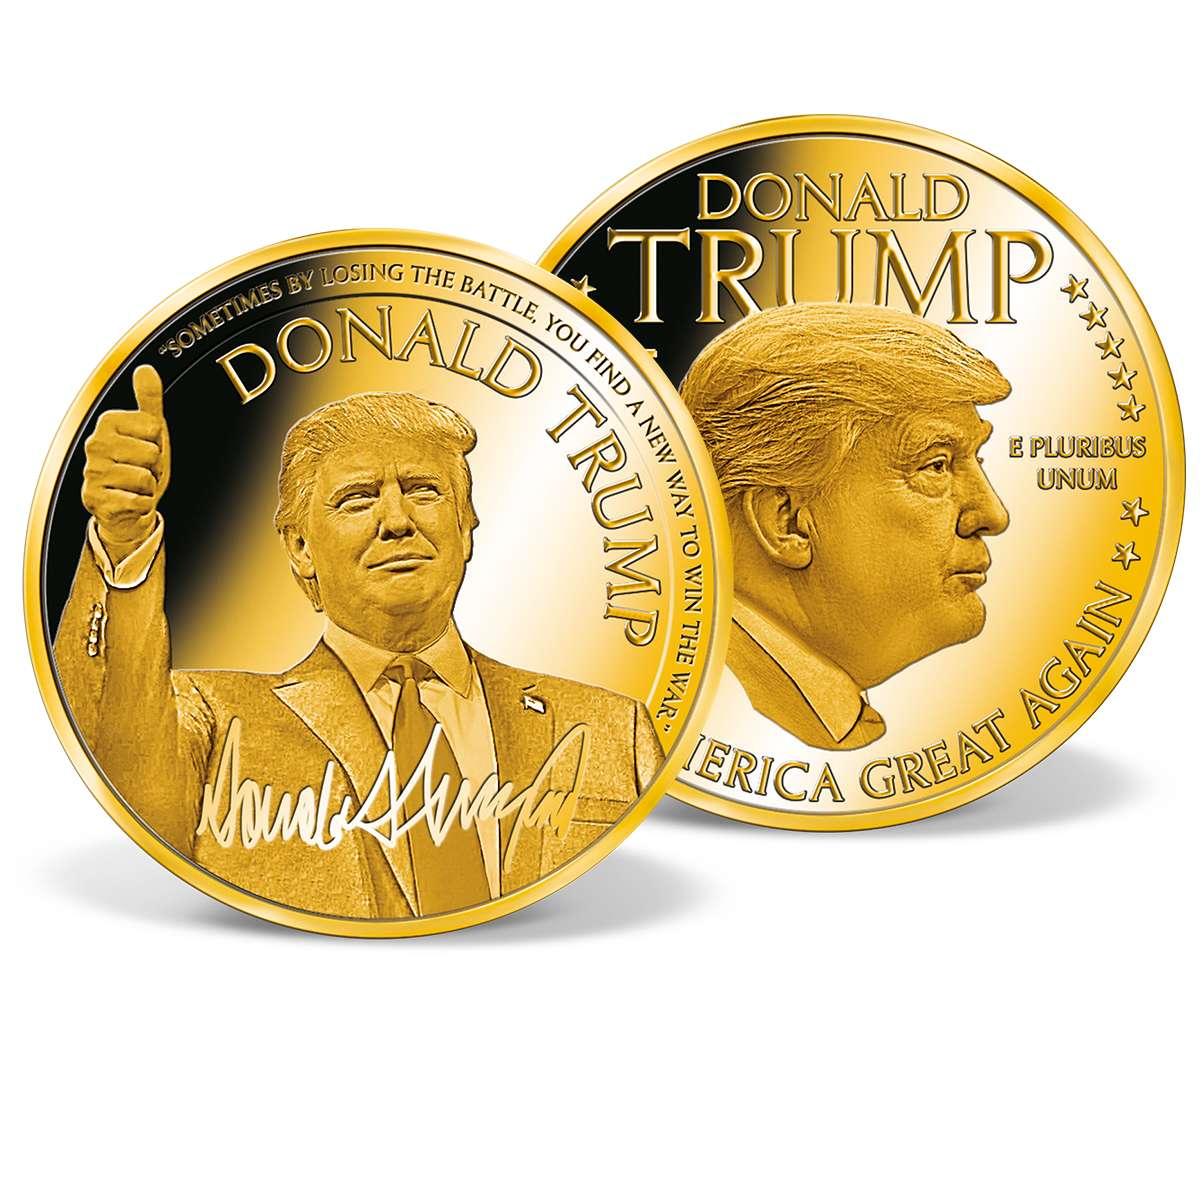 Donald Trump Make America Great Again Commemorative Gold